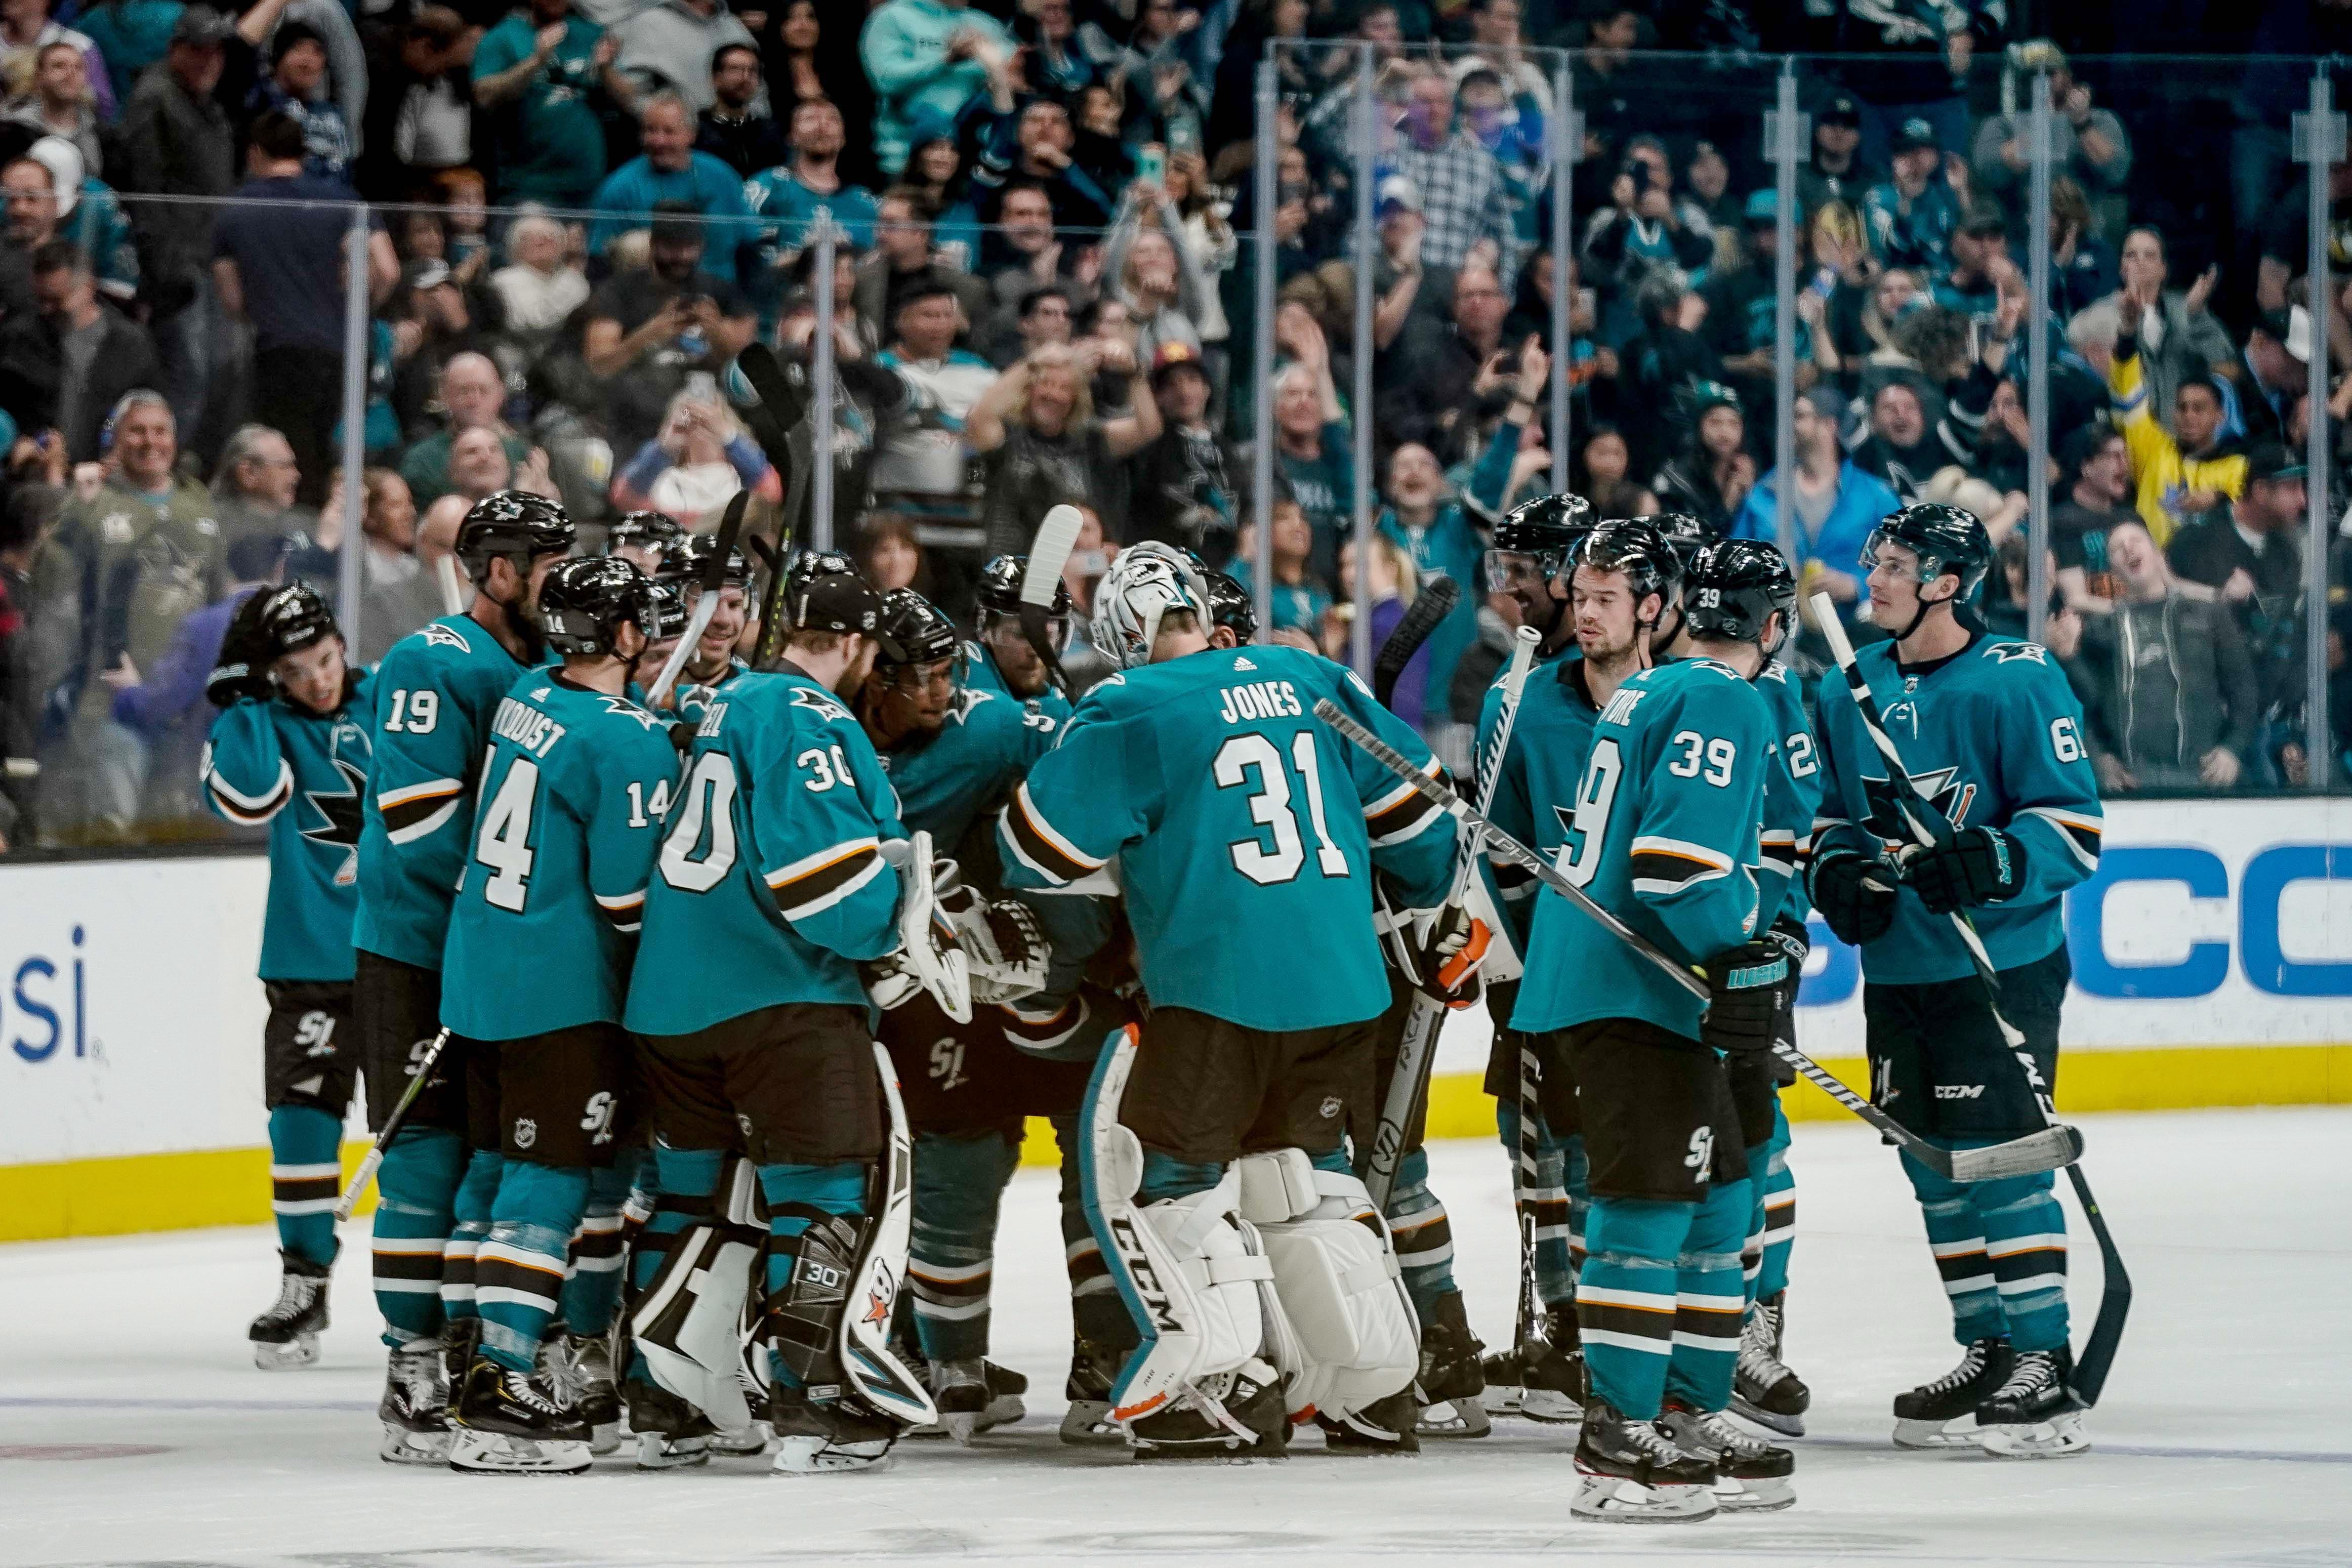 San Jose Sharks celebrate after defeating the Vegas Golden Knights during overtime at SAP Center at San Jose.